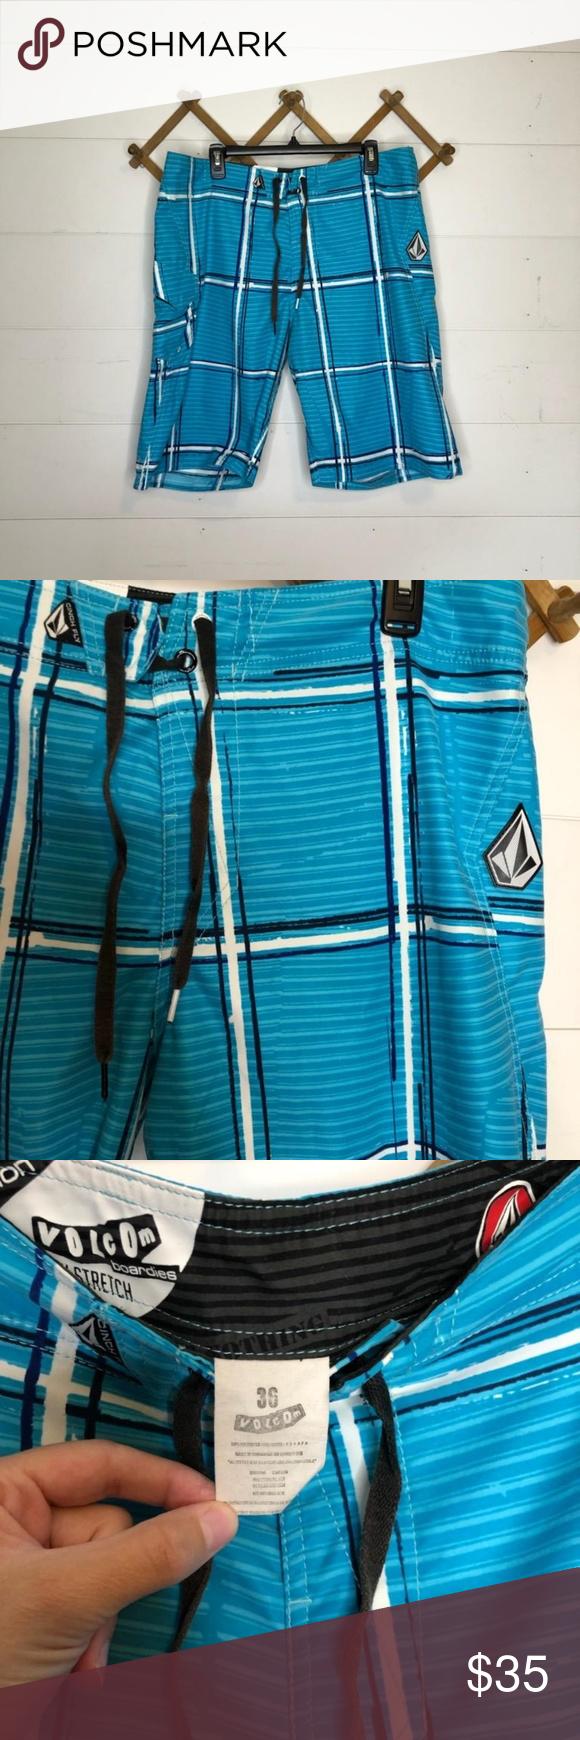 Volcom bathing suit Size 36 waist men's bathing suit Volcom Swim Swim Trunks #mensbathingsuits